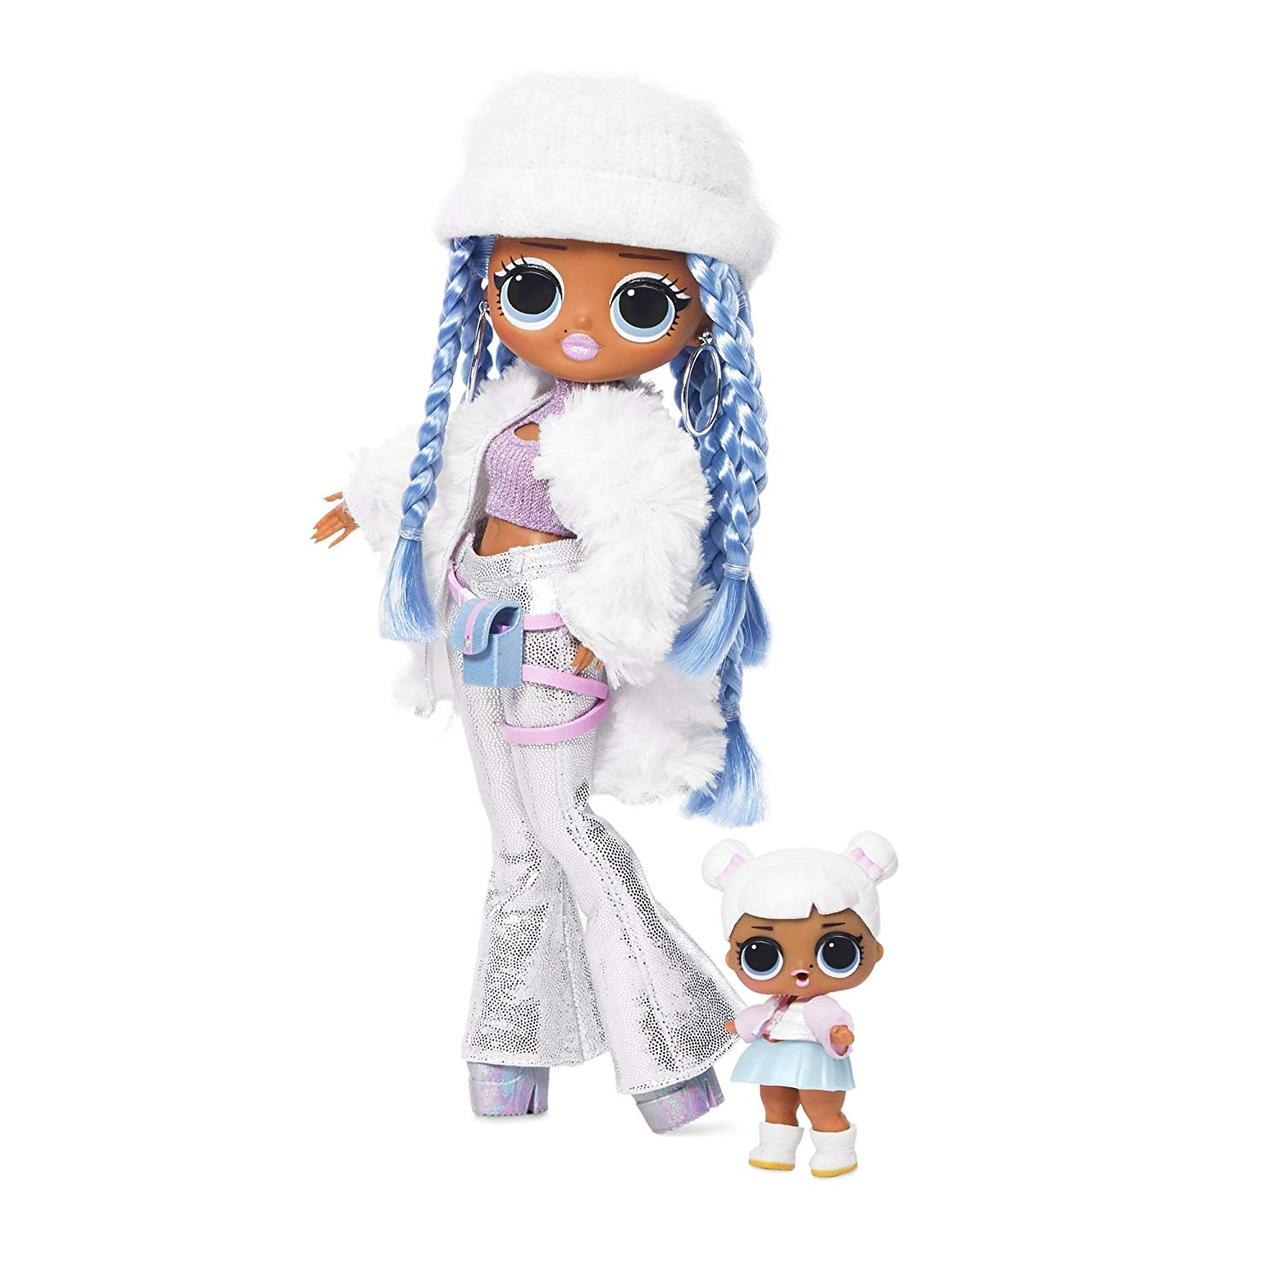 L.O.L. Surprise! O.M.G. Winter Disco Snowlicious / ЛОЛ Сюрприз ОМГ Сноулишс + сестричка Snow Angel